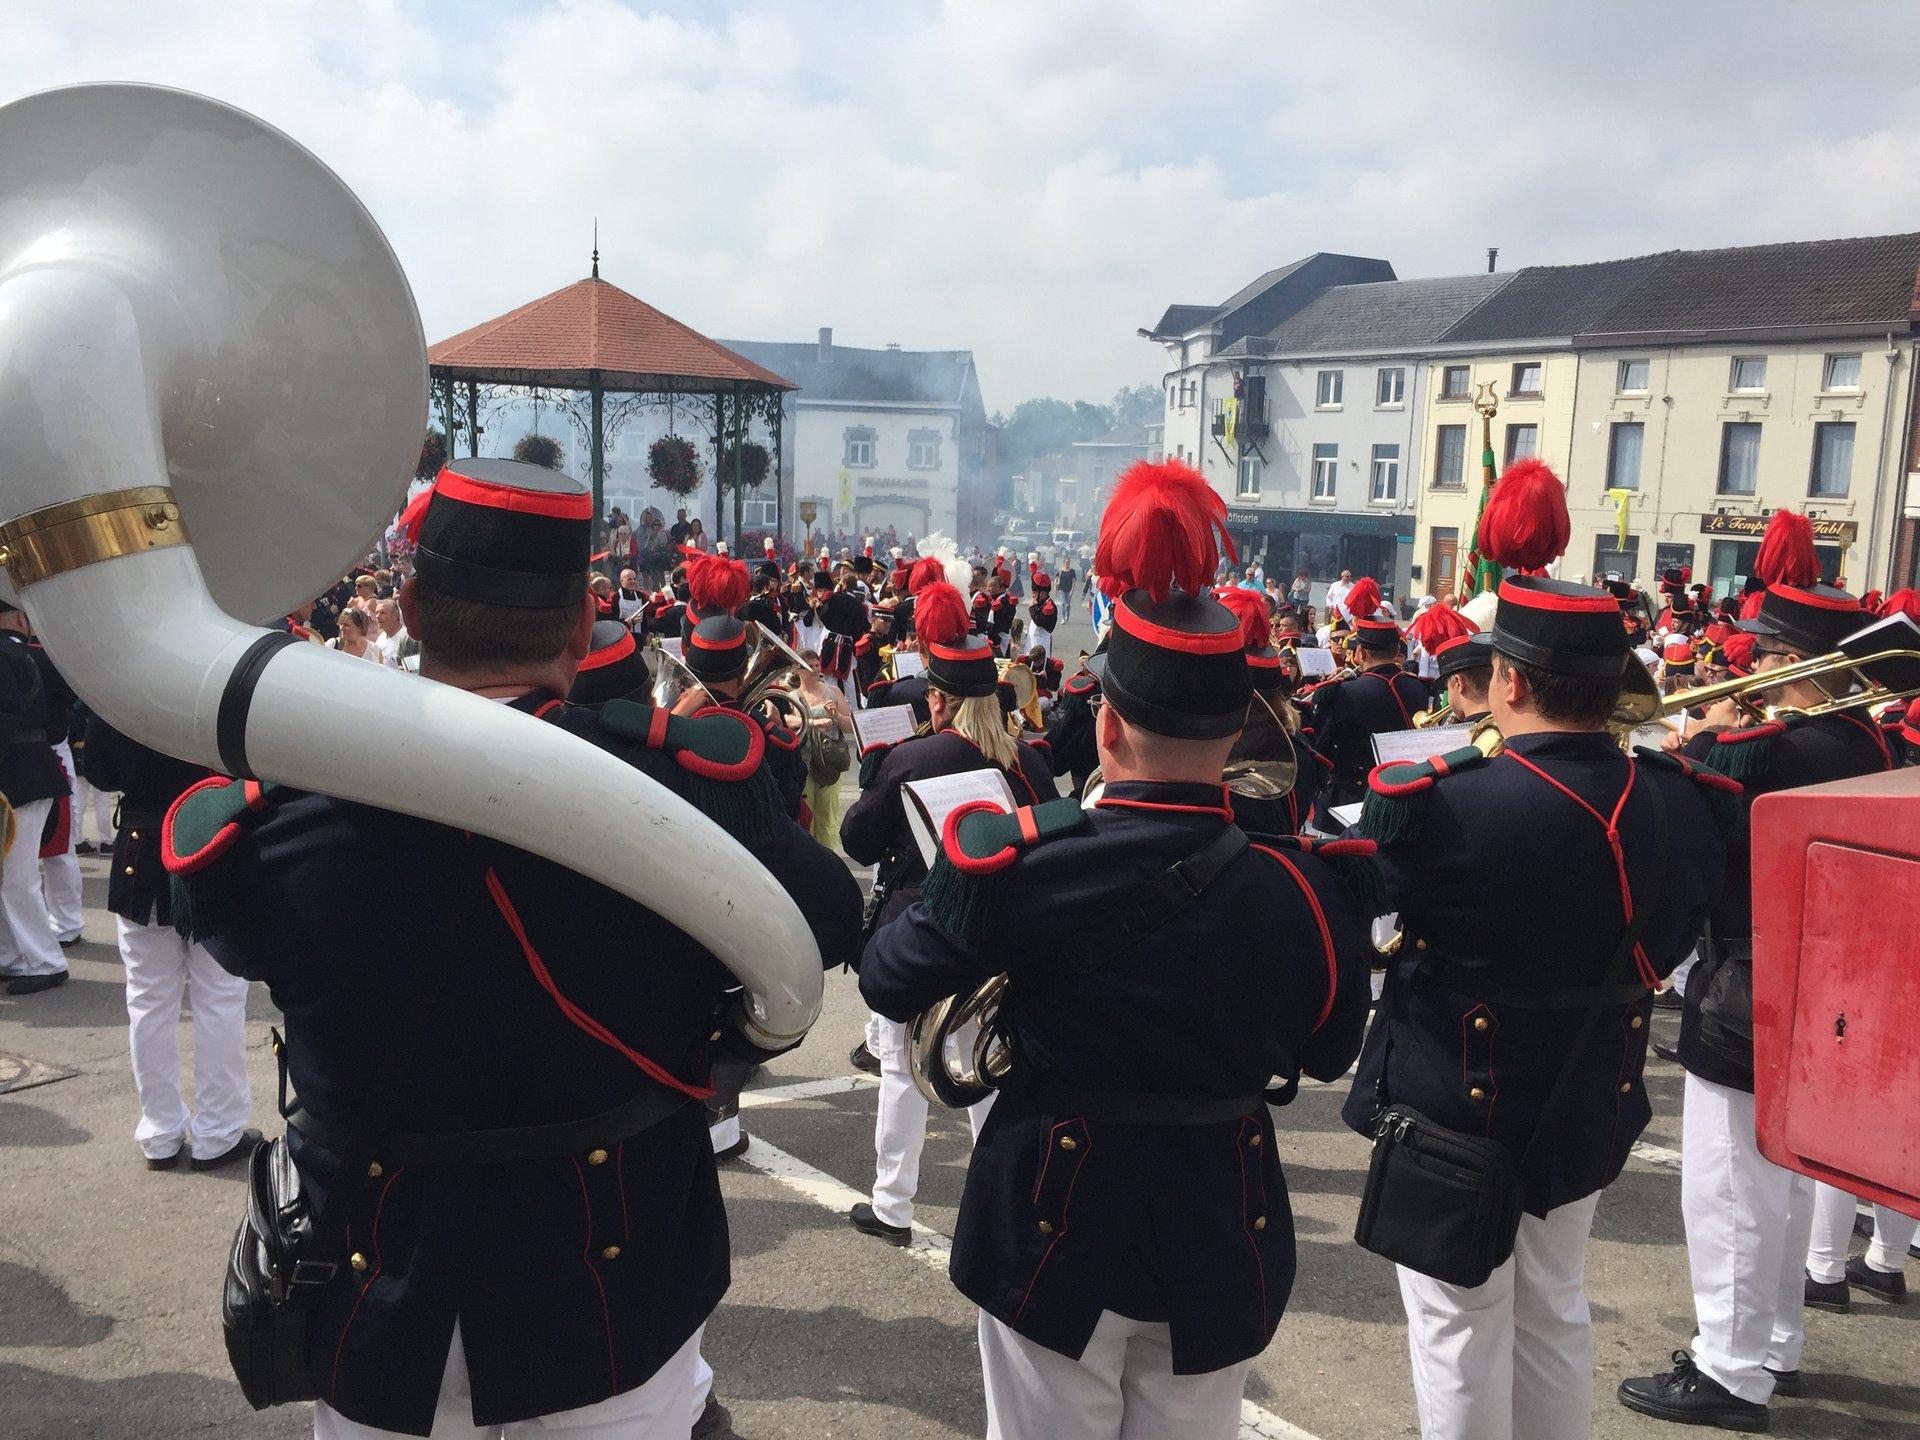 Marches of Entre-Sambre-et-Meuse in Belgium 2020 - Best Time